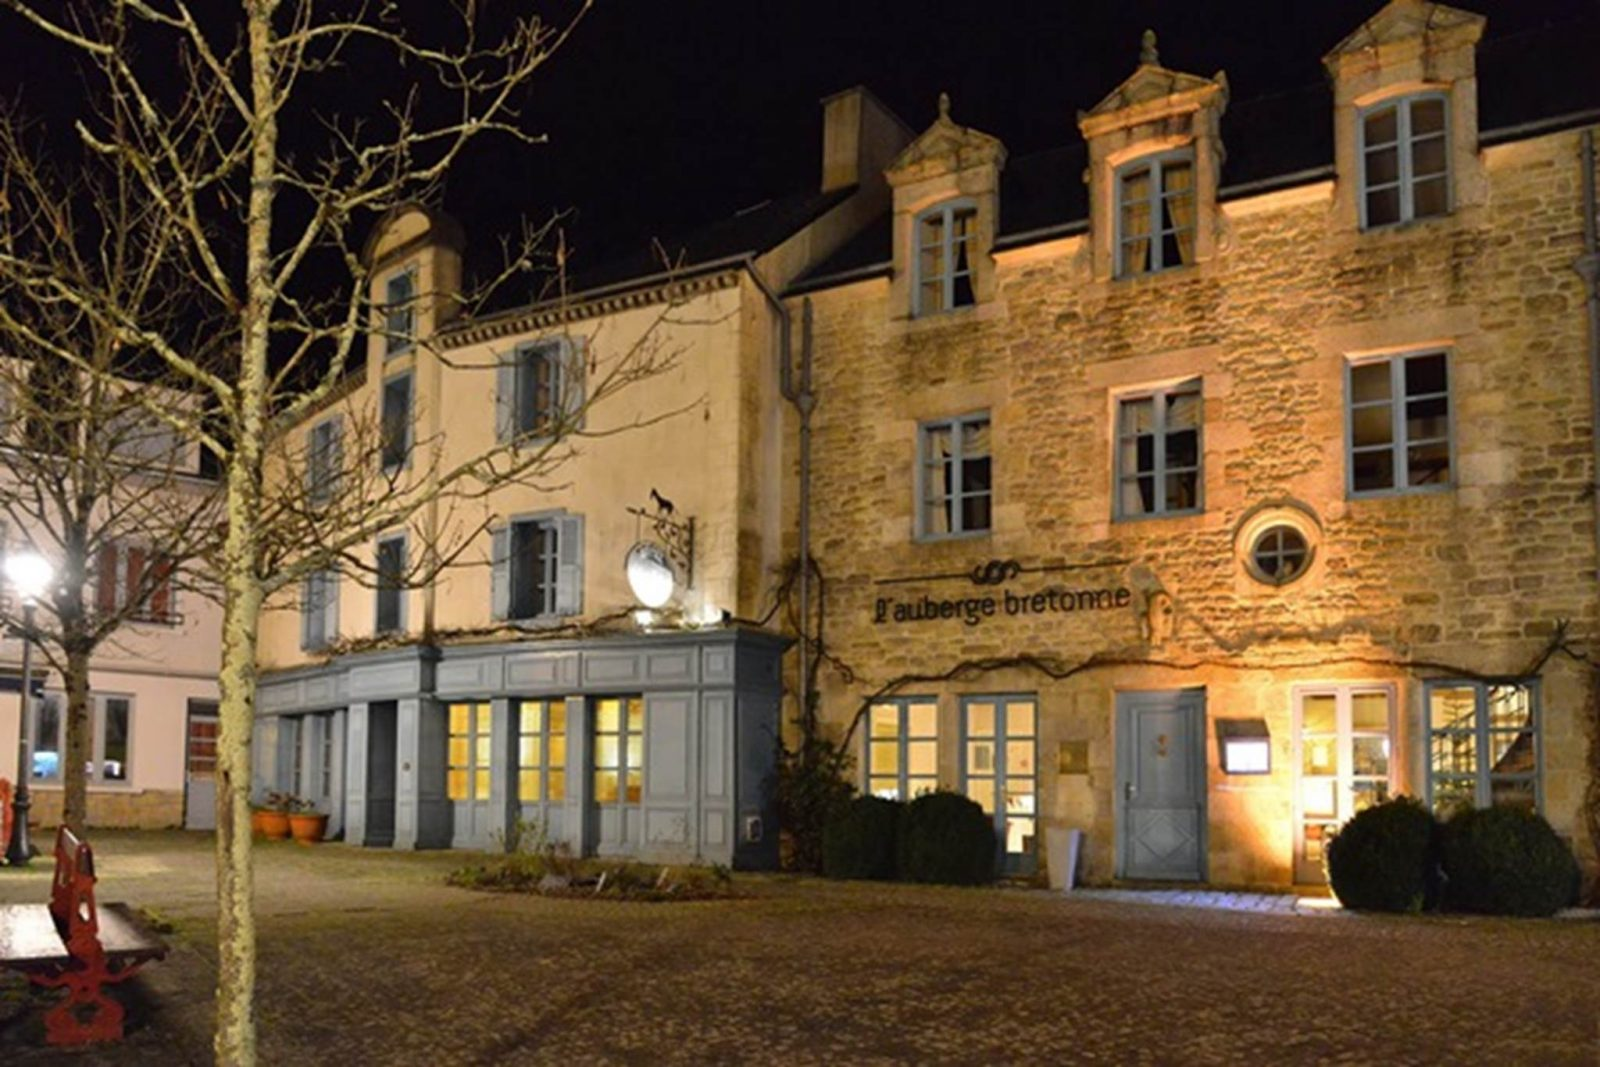 Hotel – Auberge Bretonne – La Roche-Bernard – Tourisme Arc Sud Bretagne